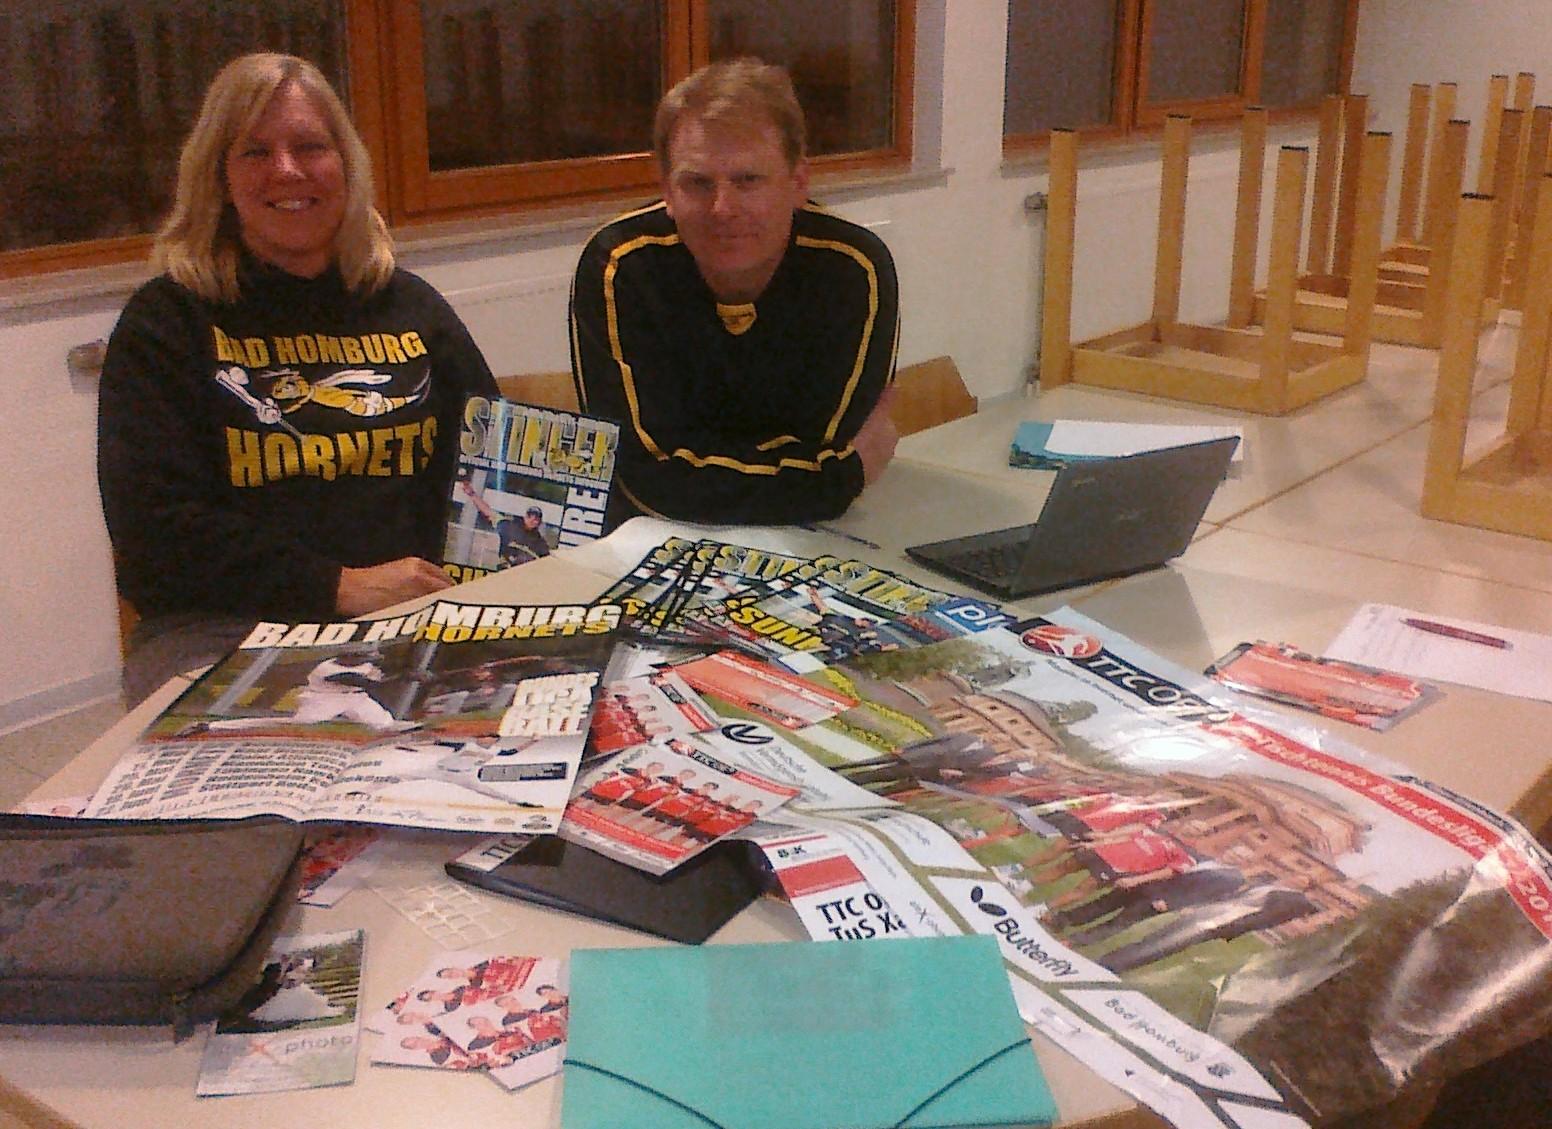 images/Deanna Rockenbach und Roland Spitzegger Baseball Hornets Bad Homburg.jpg